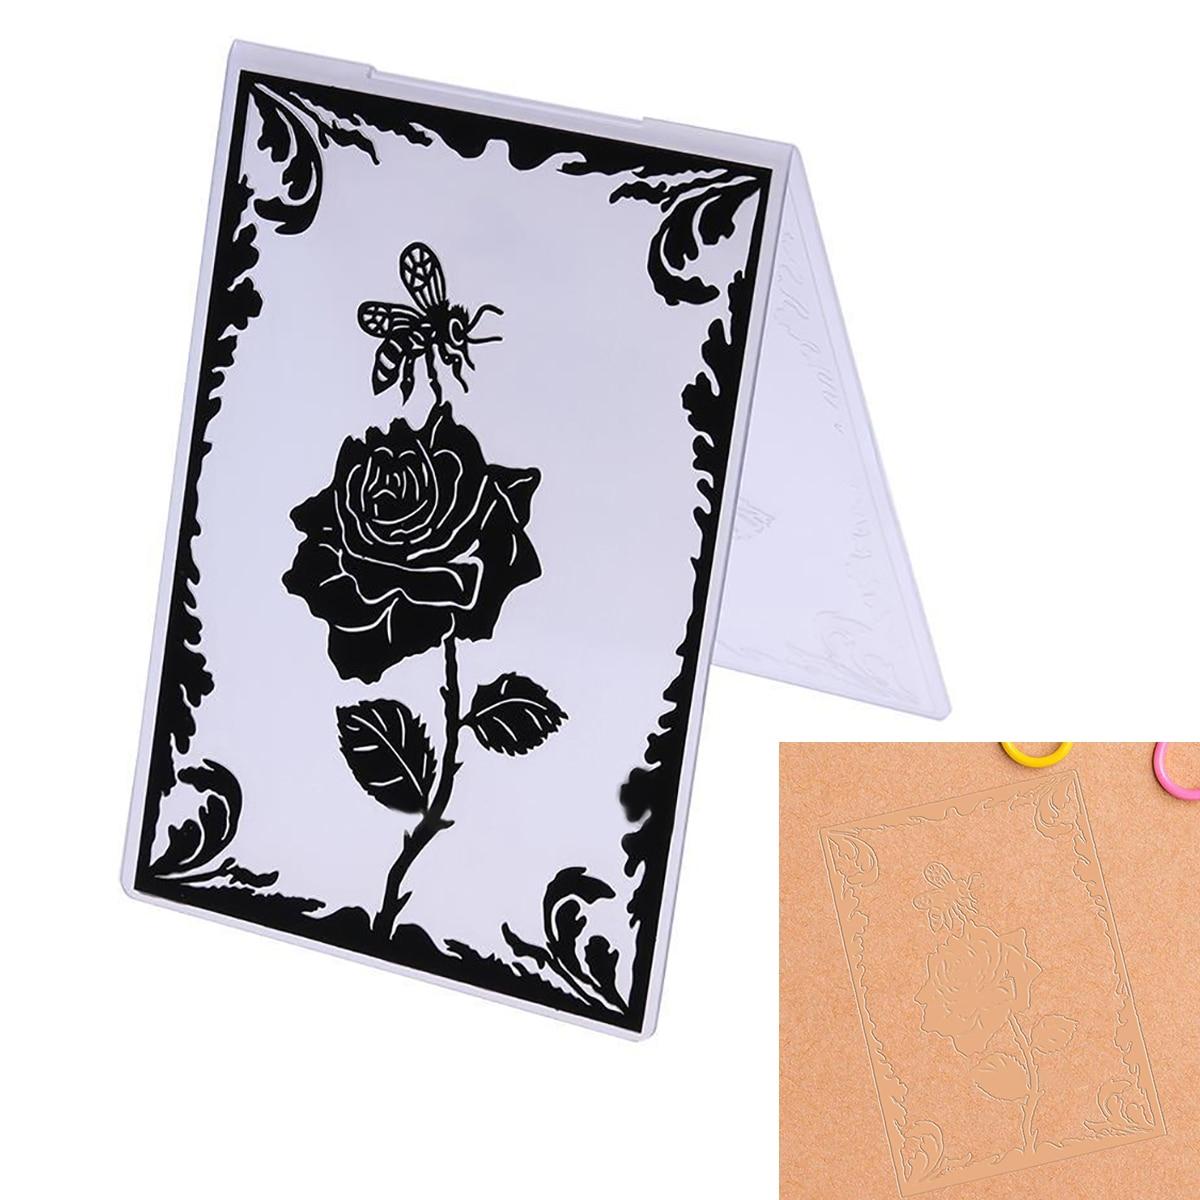 Sewing set Design Metal Cutting Die For DIY Scrapbooking Album Paper CardsYF